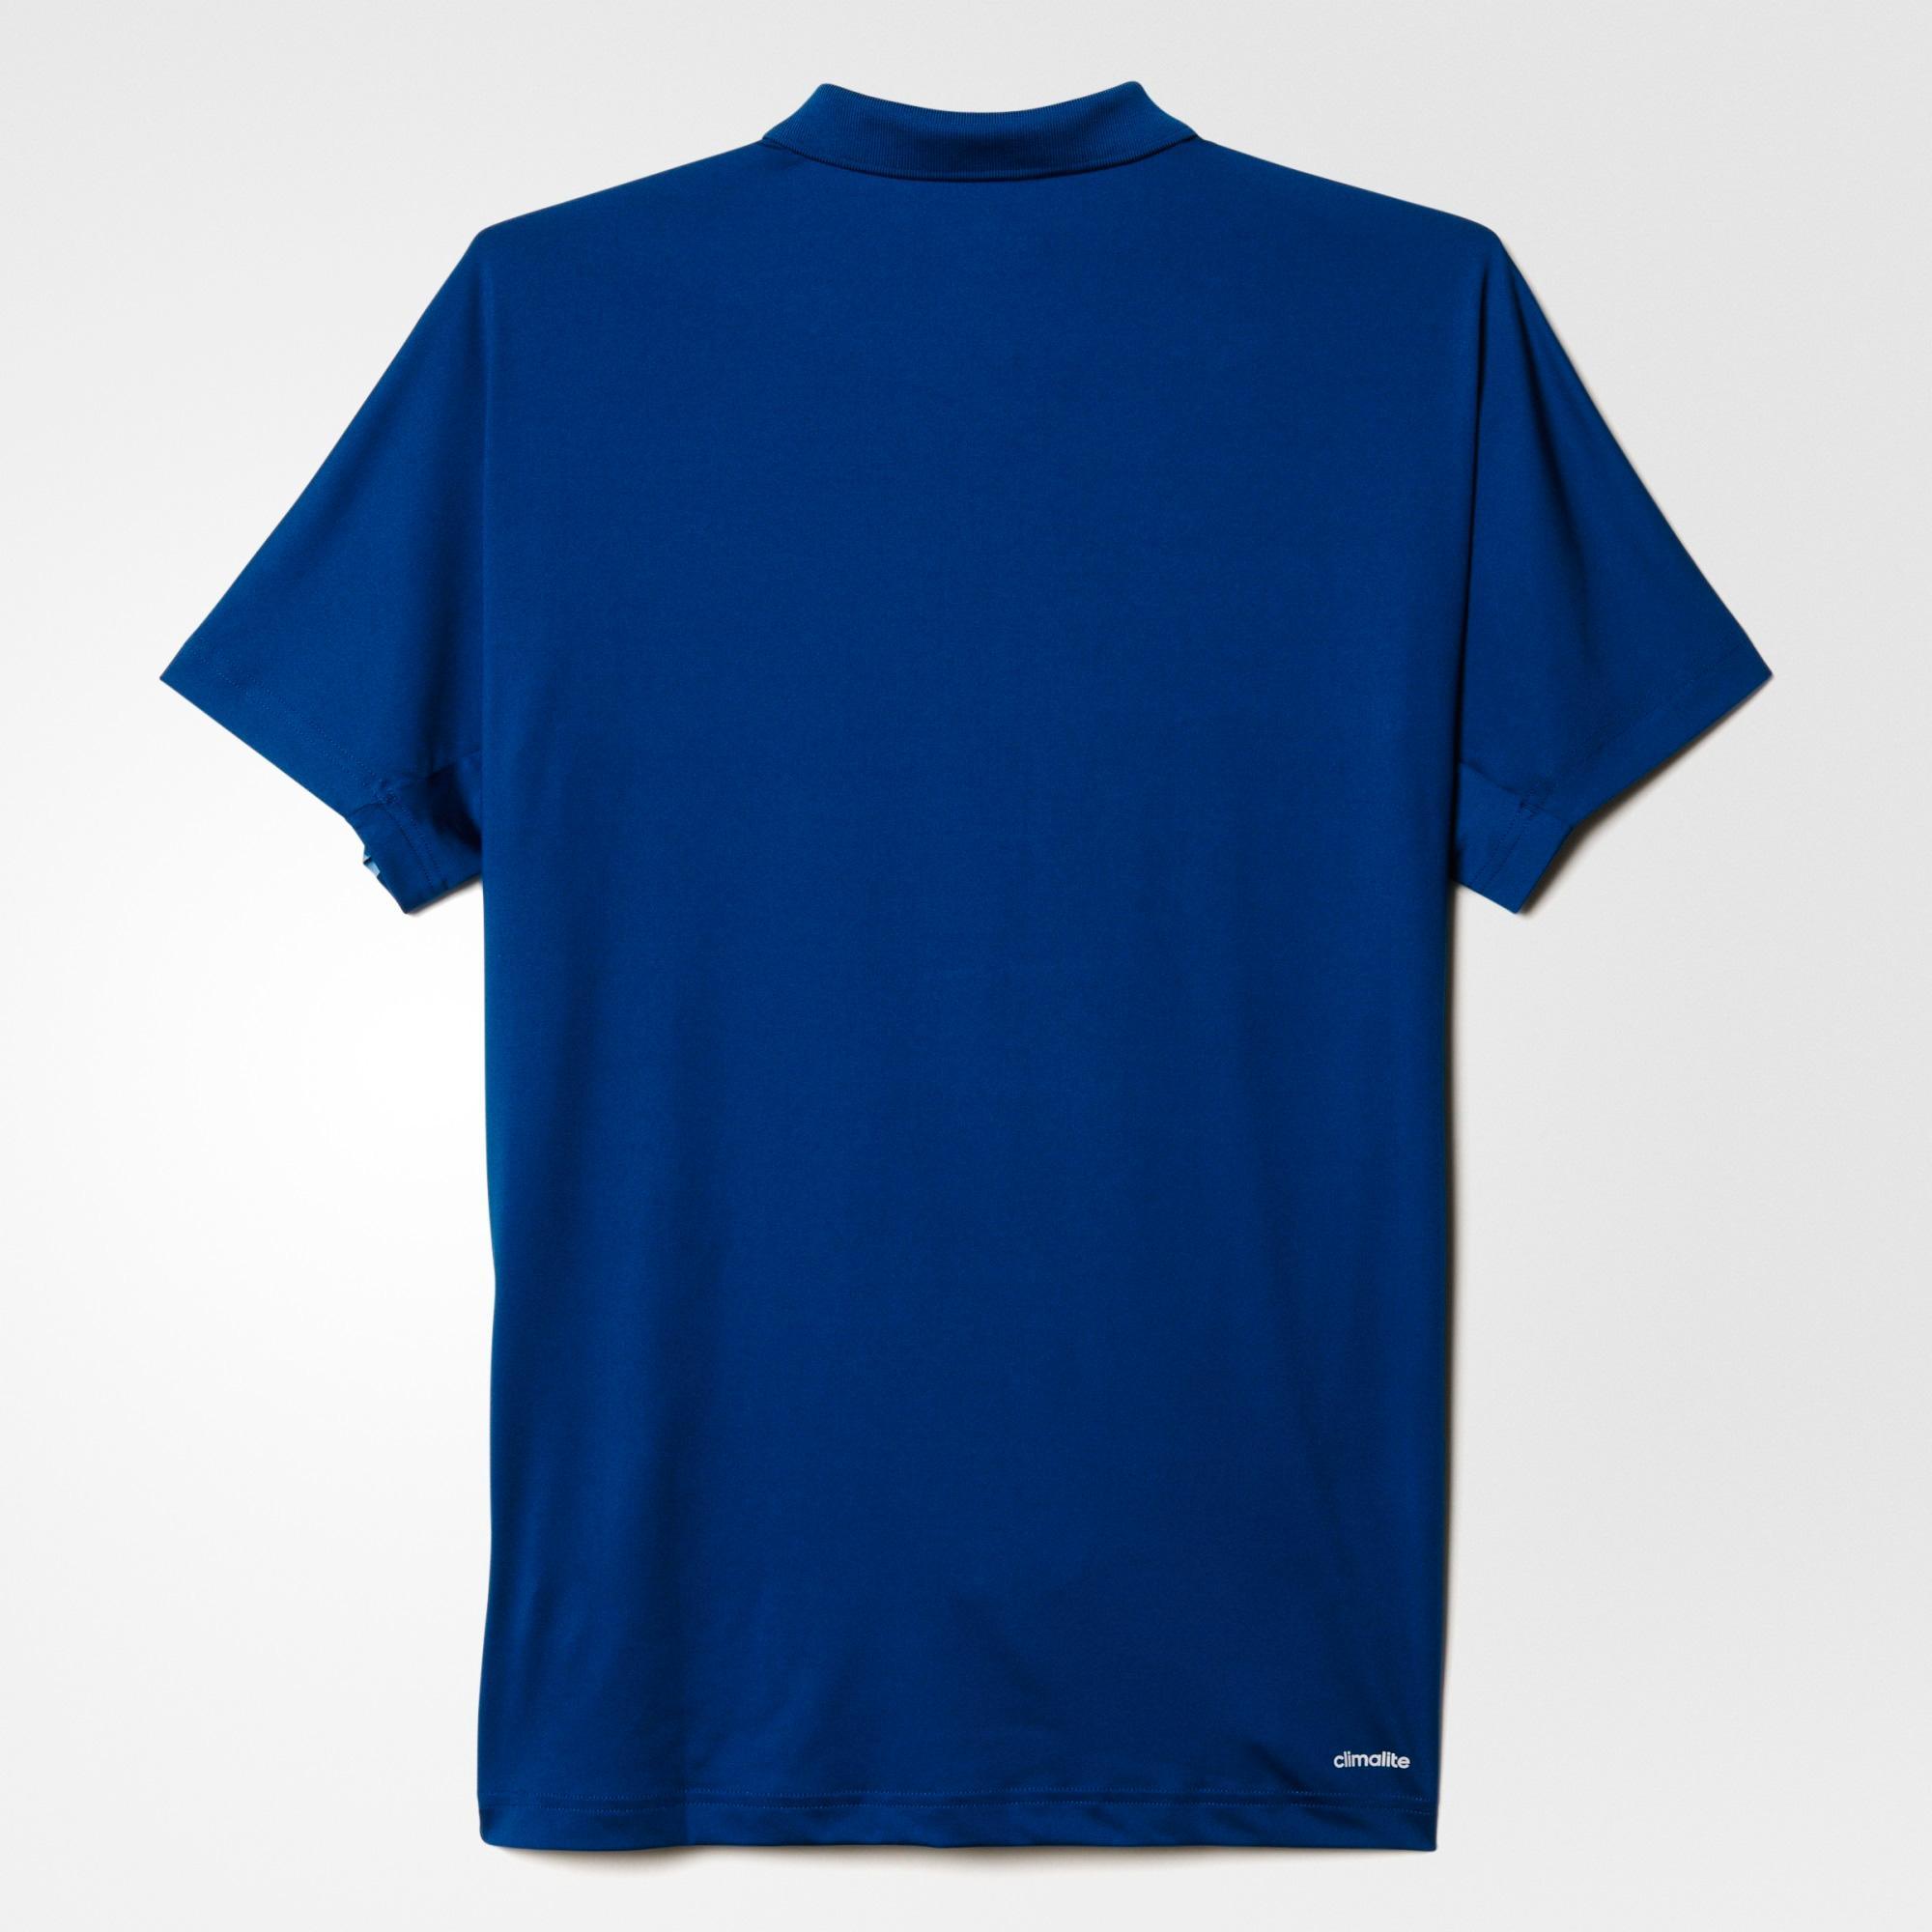 5f7d07bb3 Adidas Mens Climalite Essentials Polo Shirt